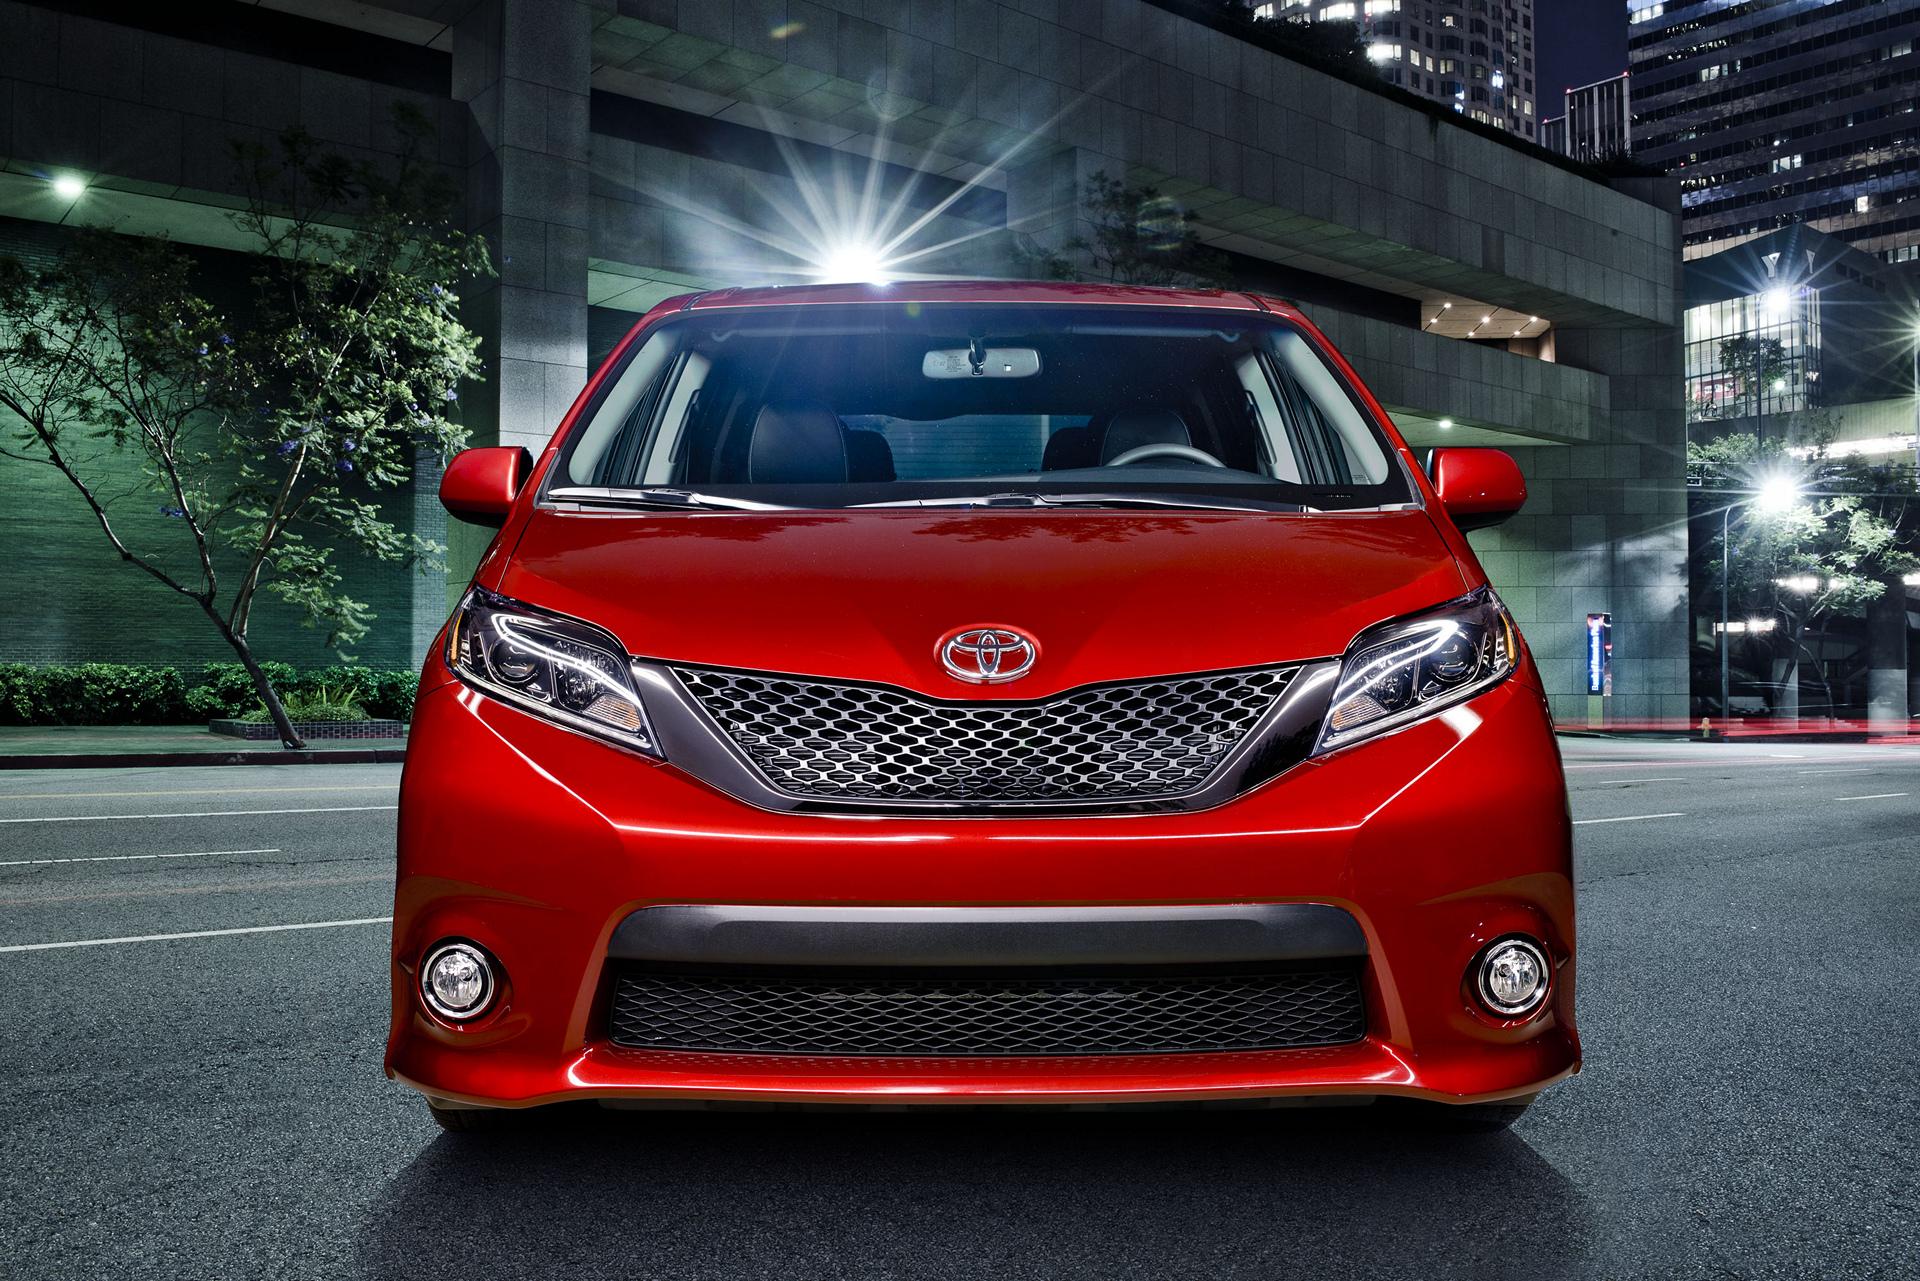 2017 Toyota Sienna SE © Toyota Motor Corporation